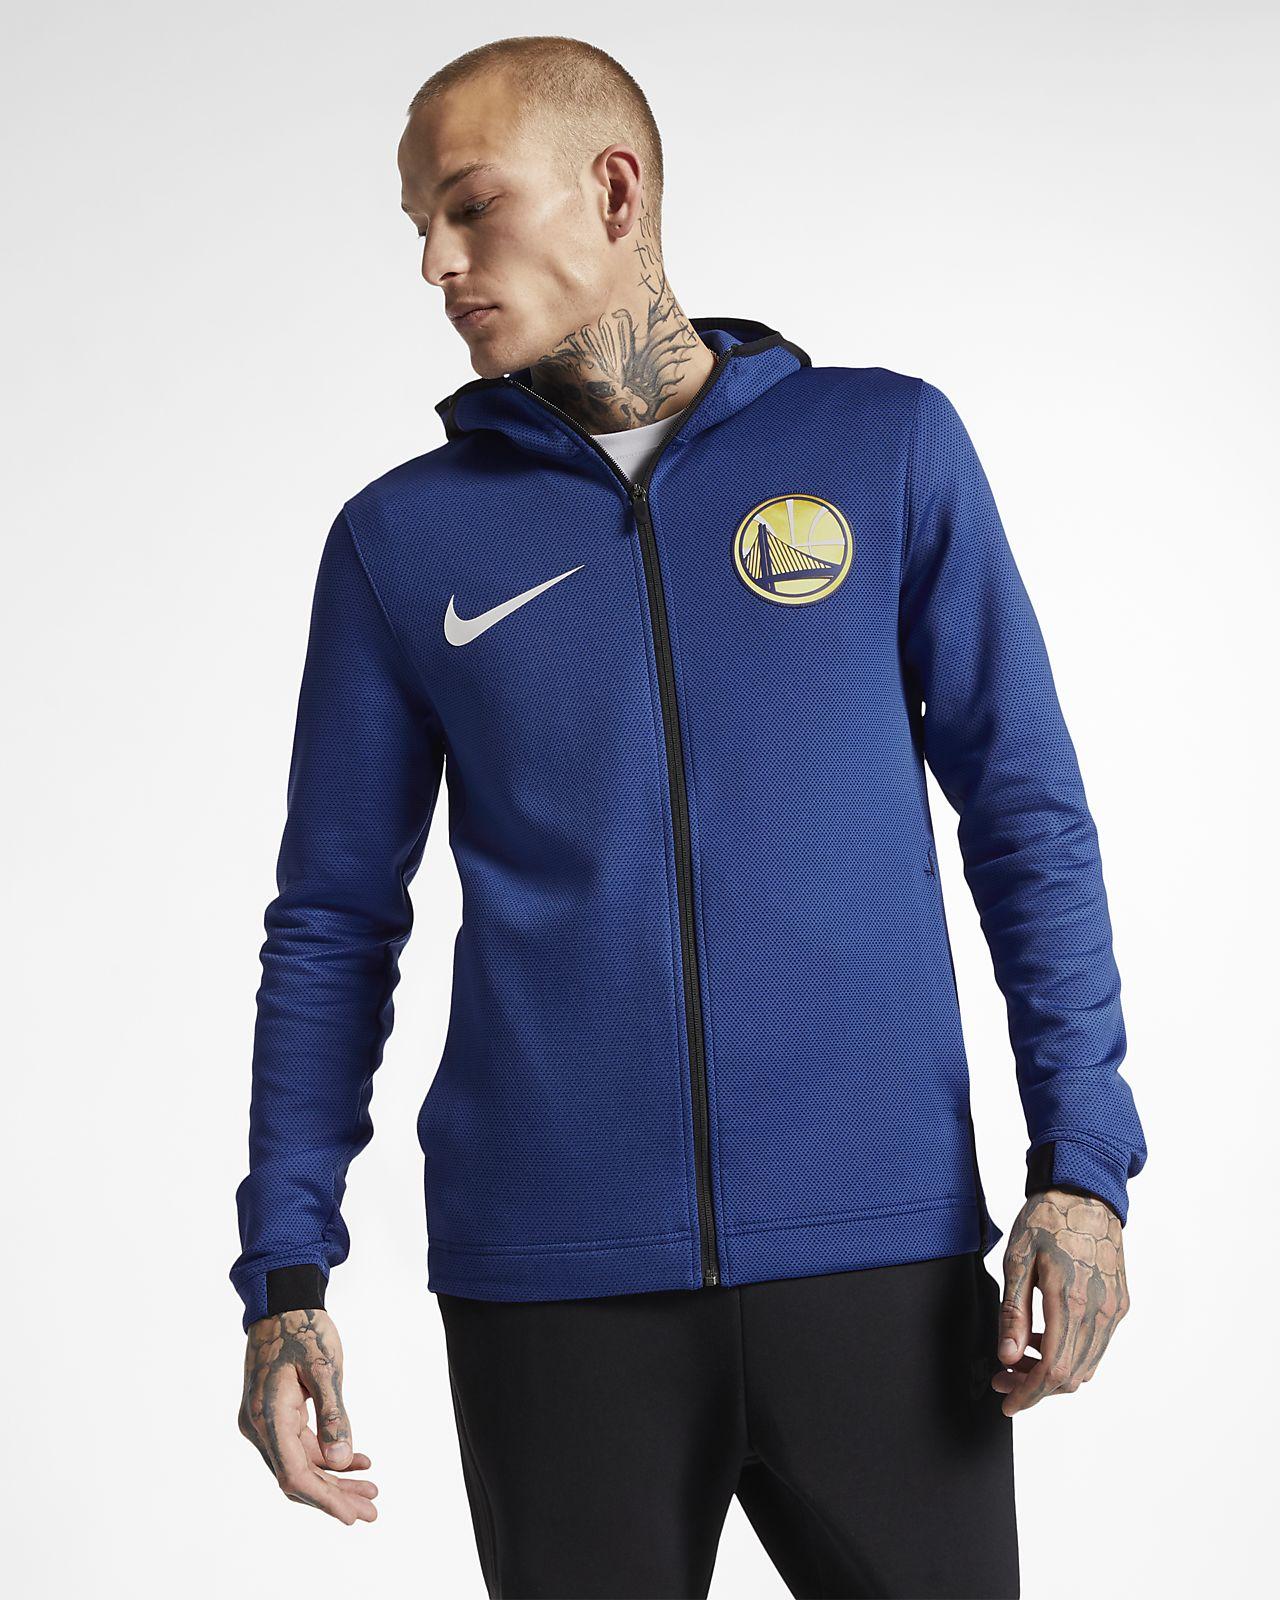 Golden State Warriors Nike Therma Flex Showtime Sudadera con capucha de la NBA - Hombre